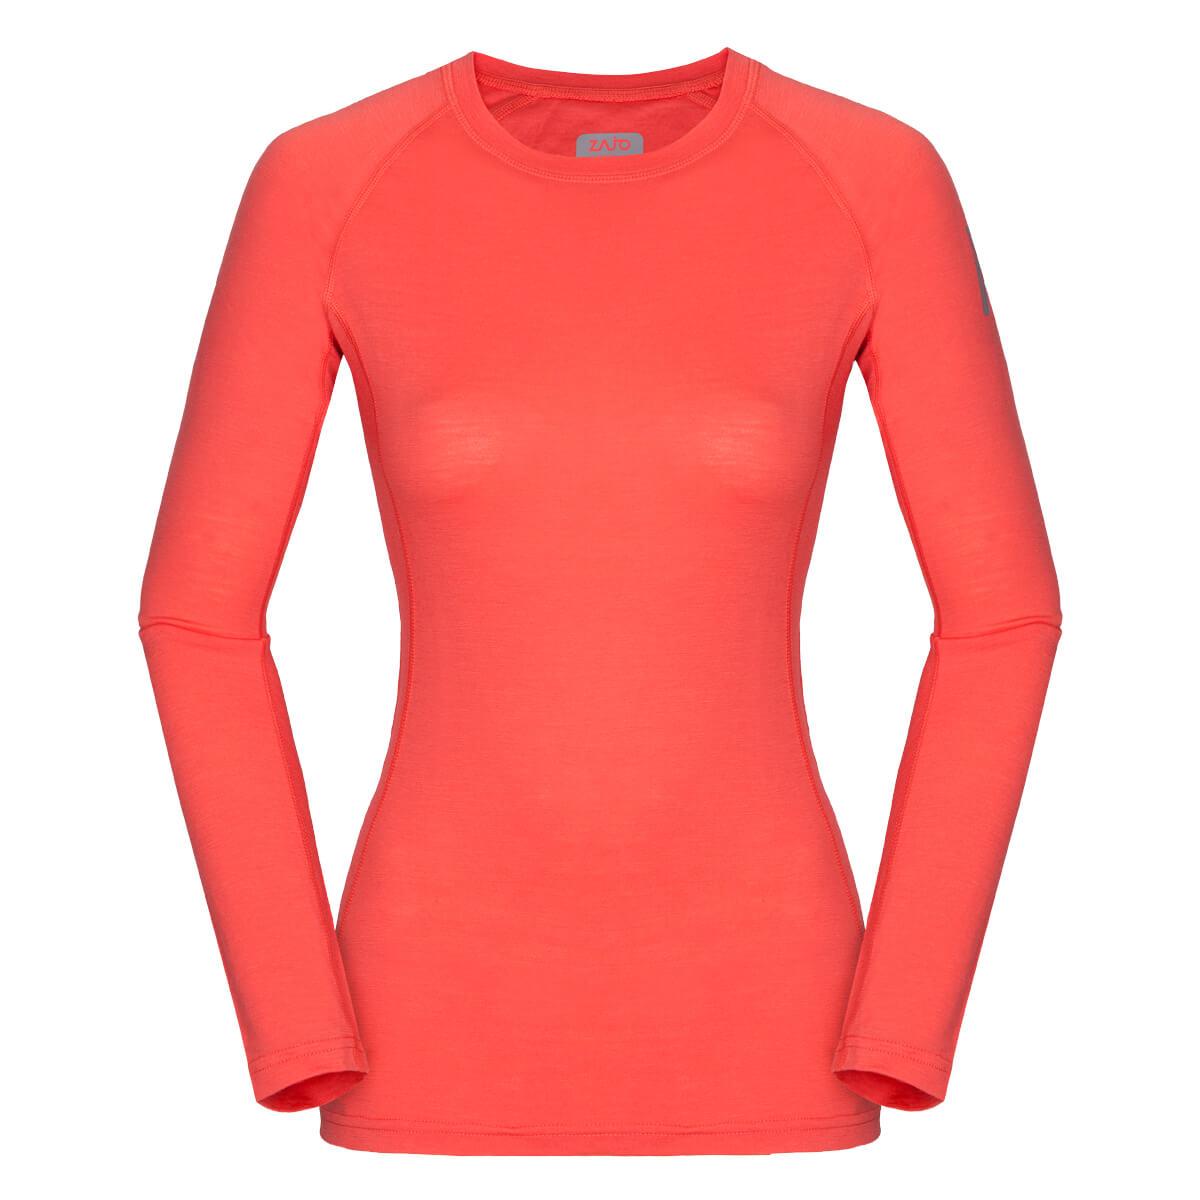 Dámske tričko Elsa Merino W T-shirt LS Coral - veľkosť XS